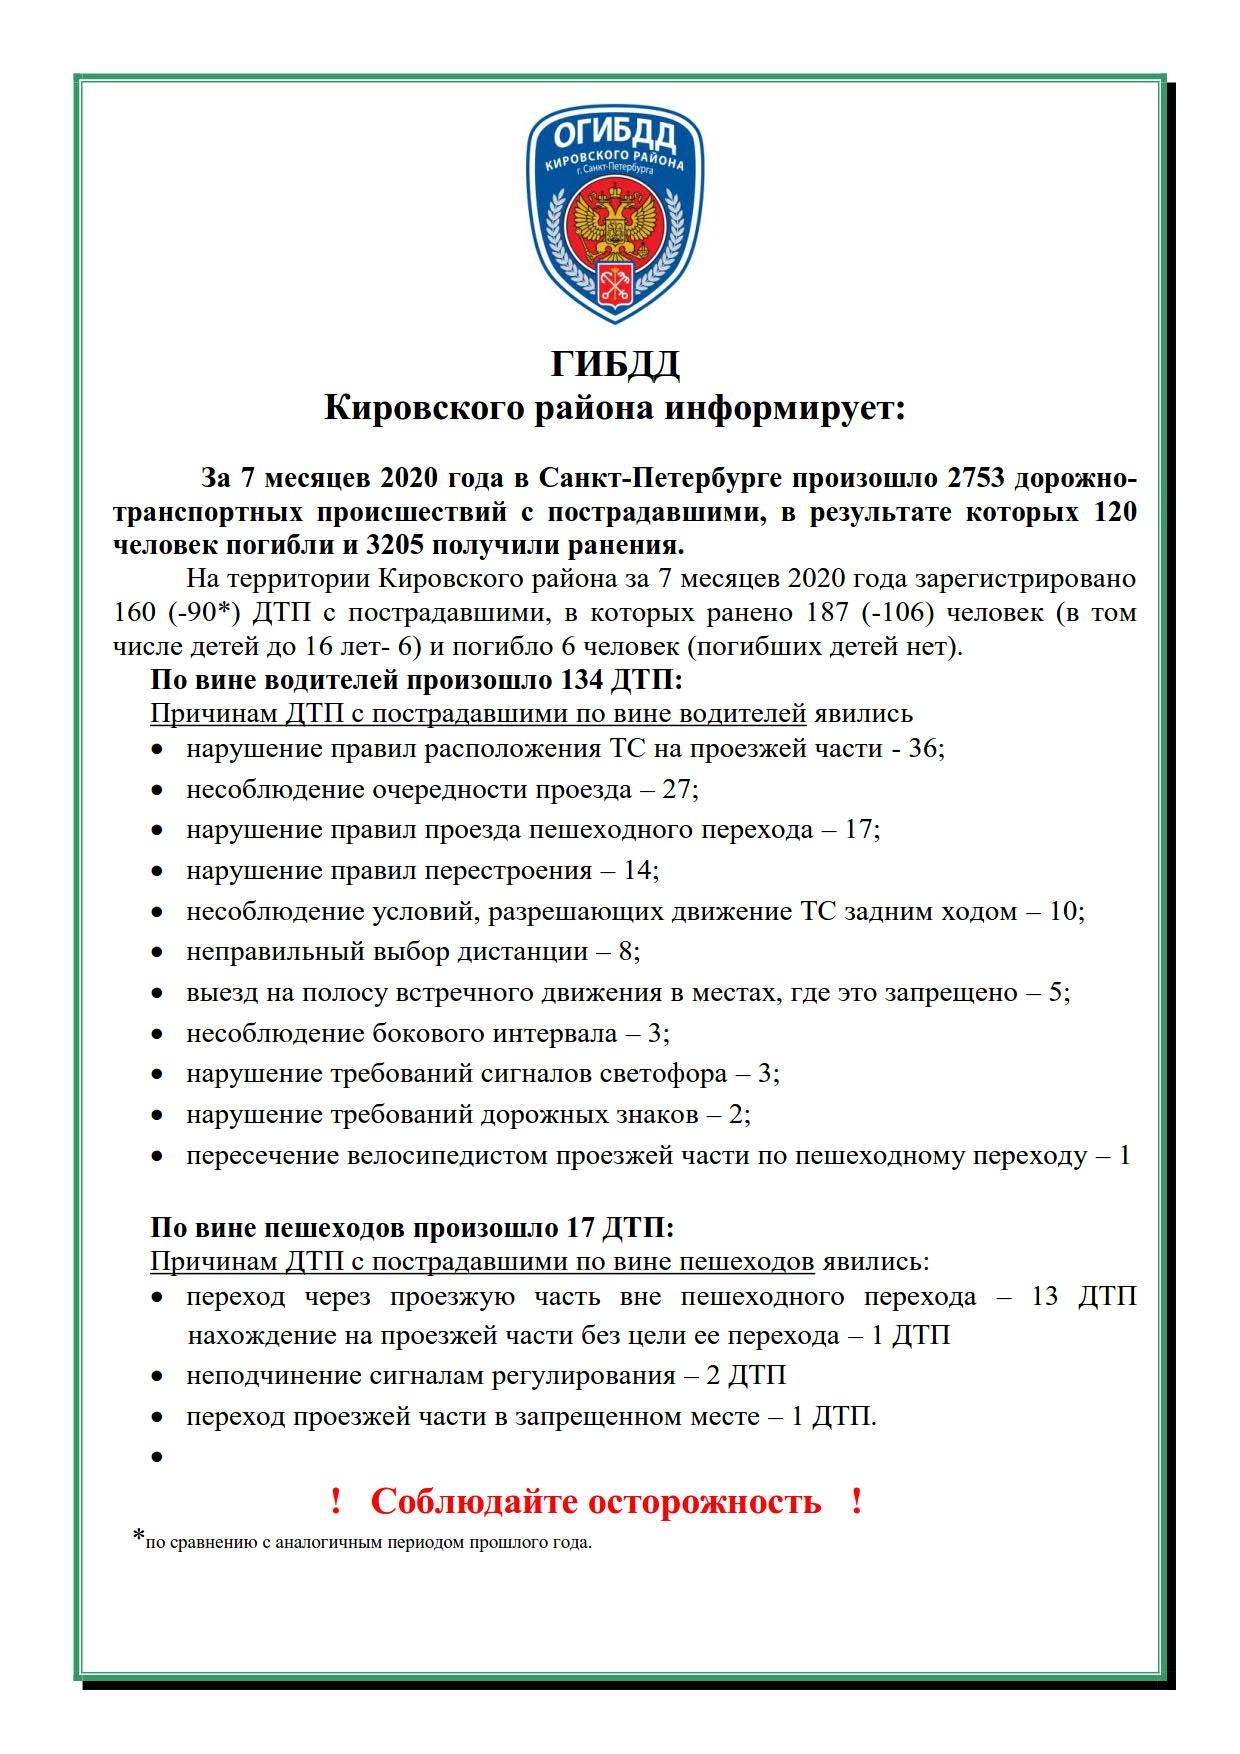 листовка ДТП 7 мес 2020_2